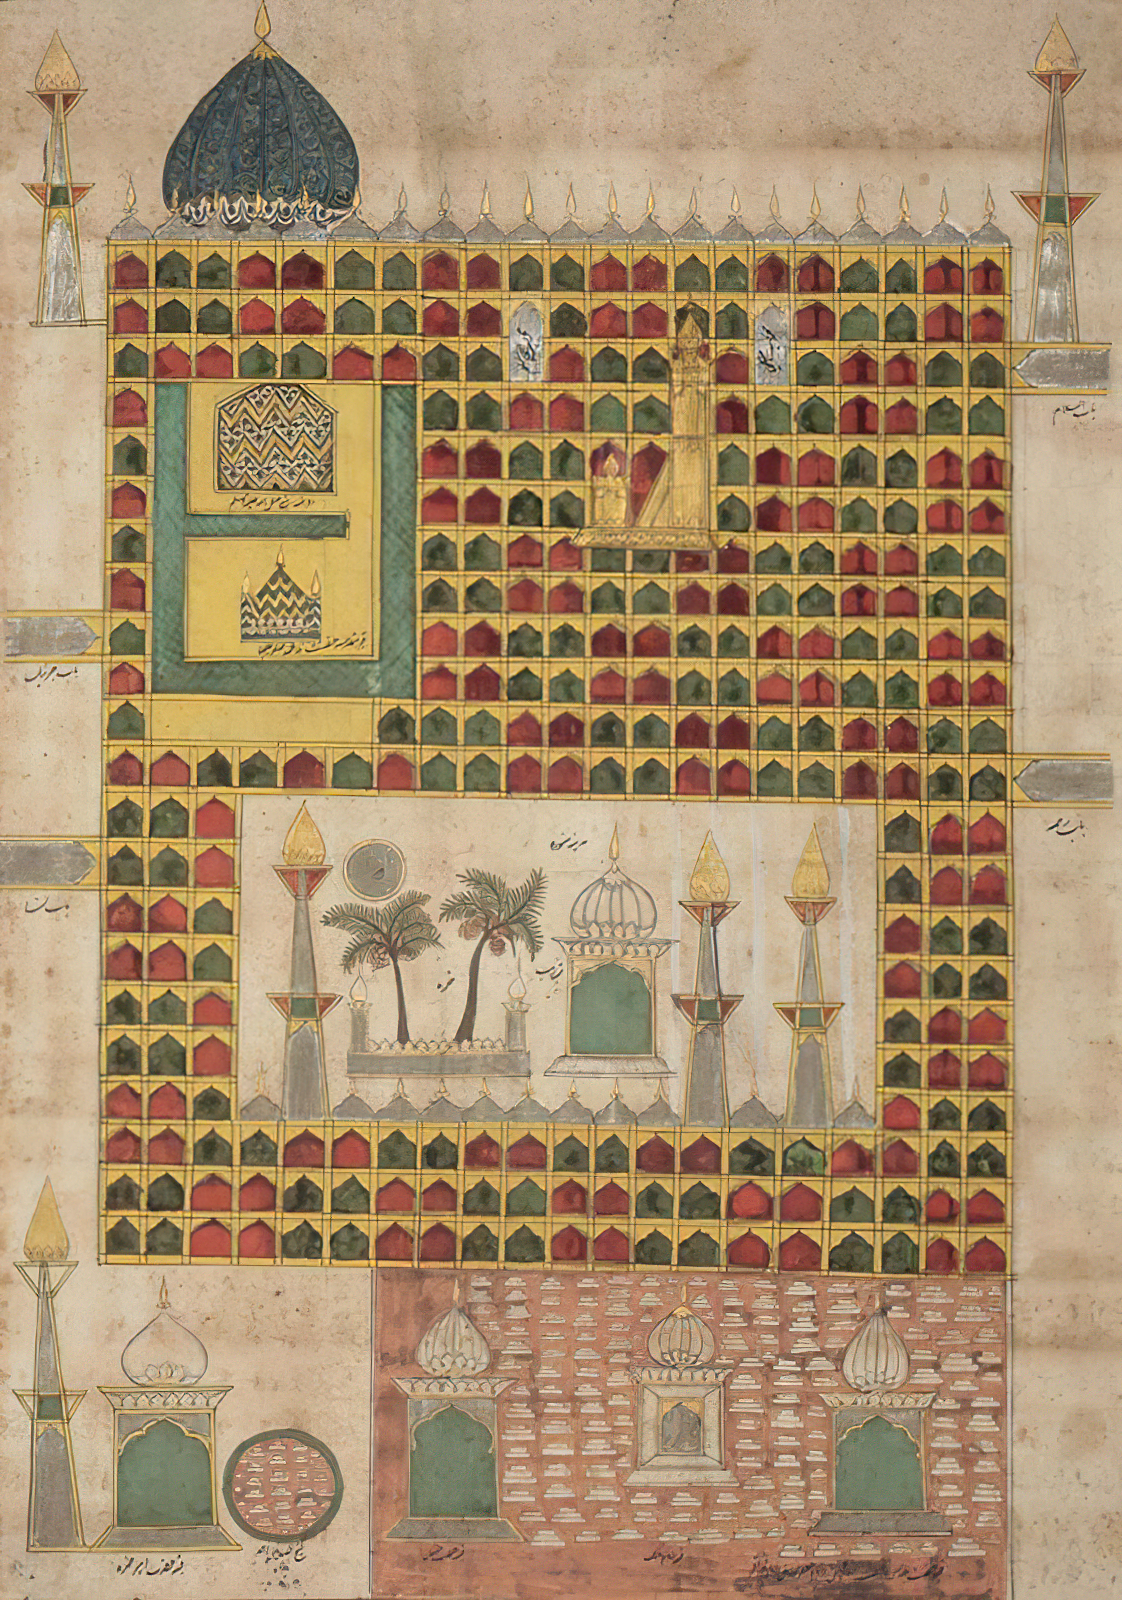 Medina depicted in a pilgrimage scroll